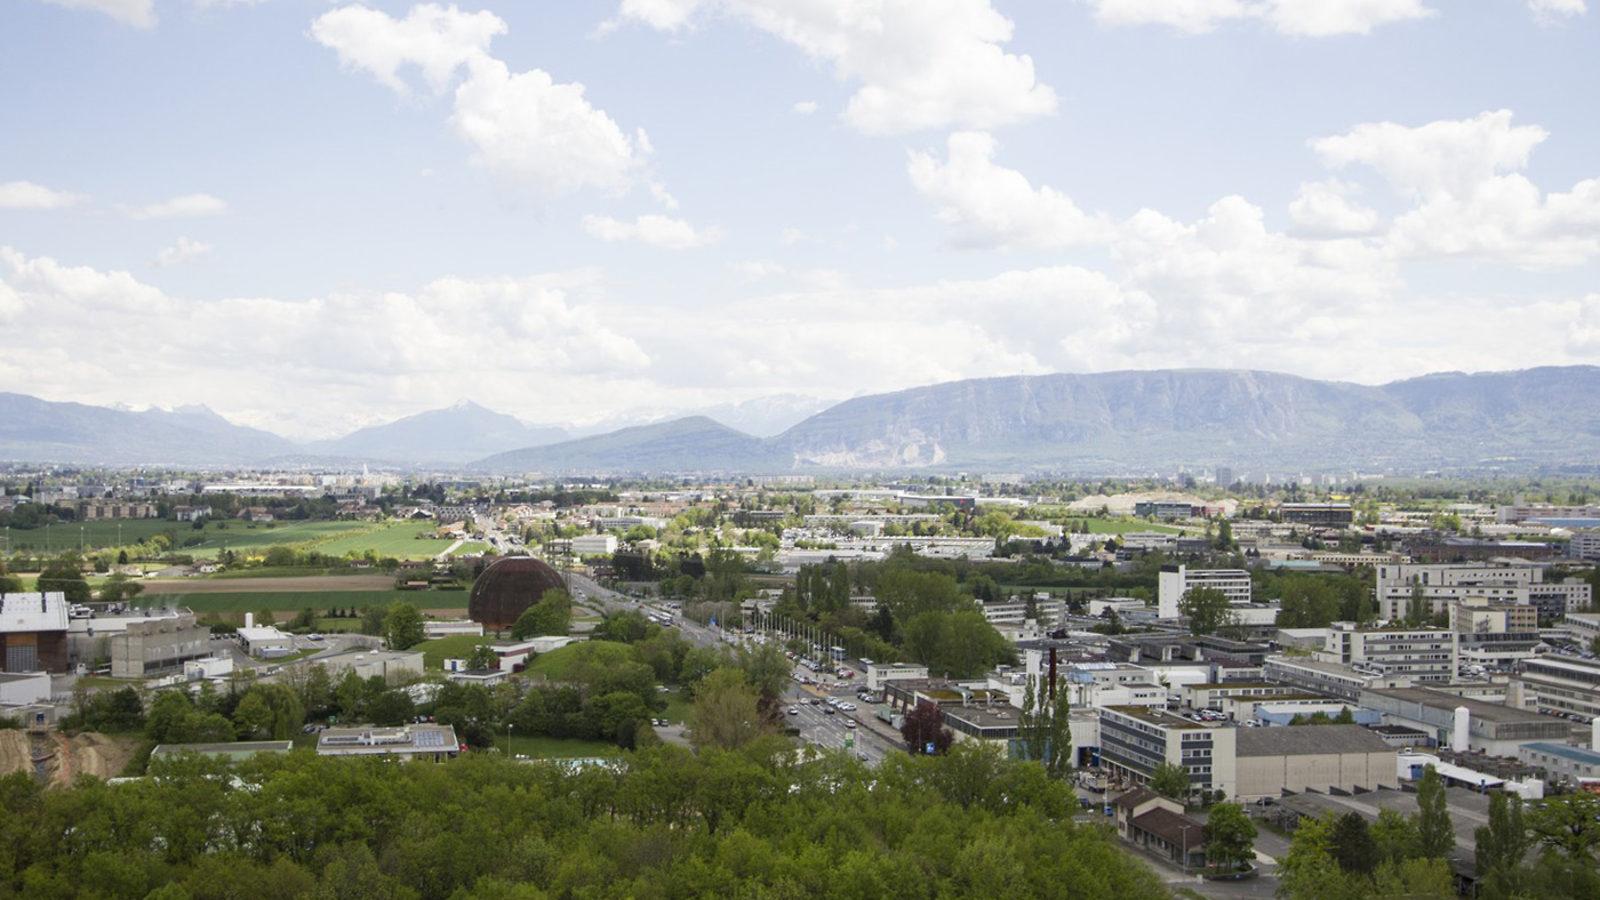 Photo: CERN aerial